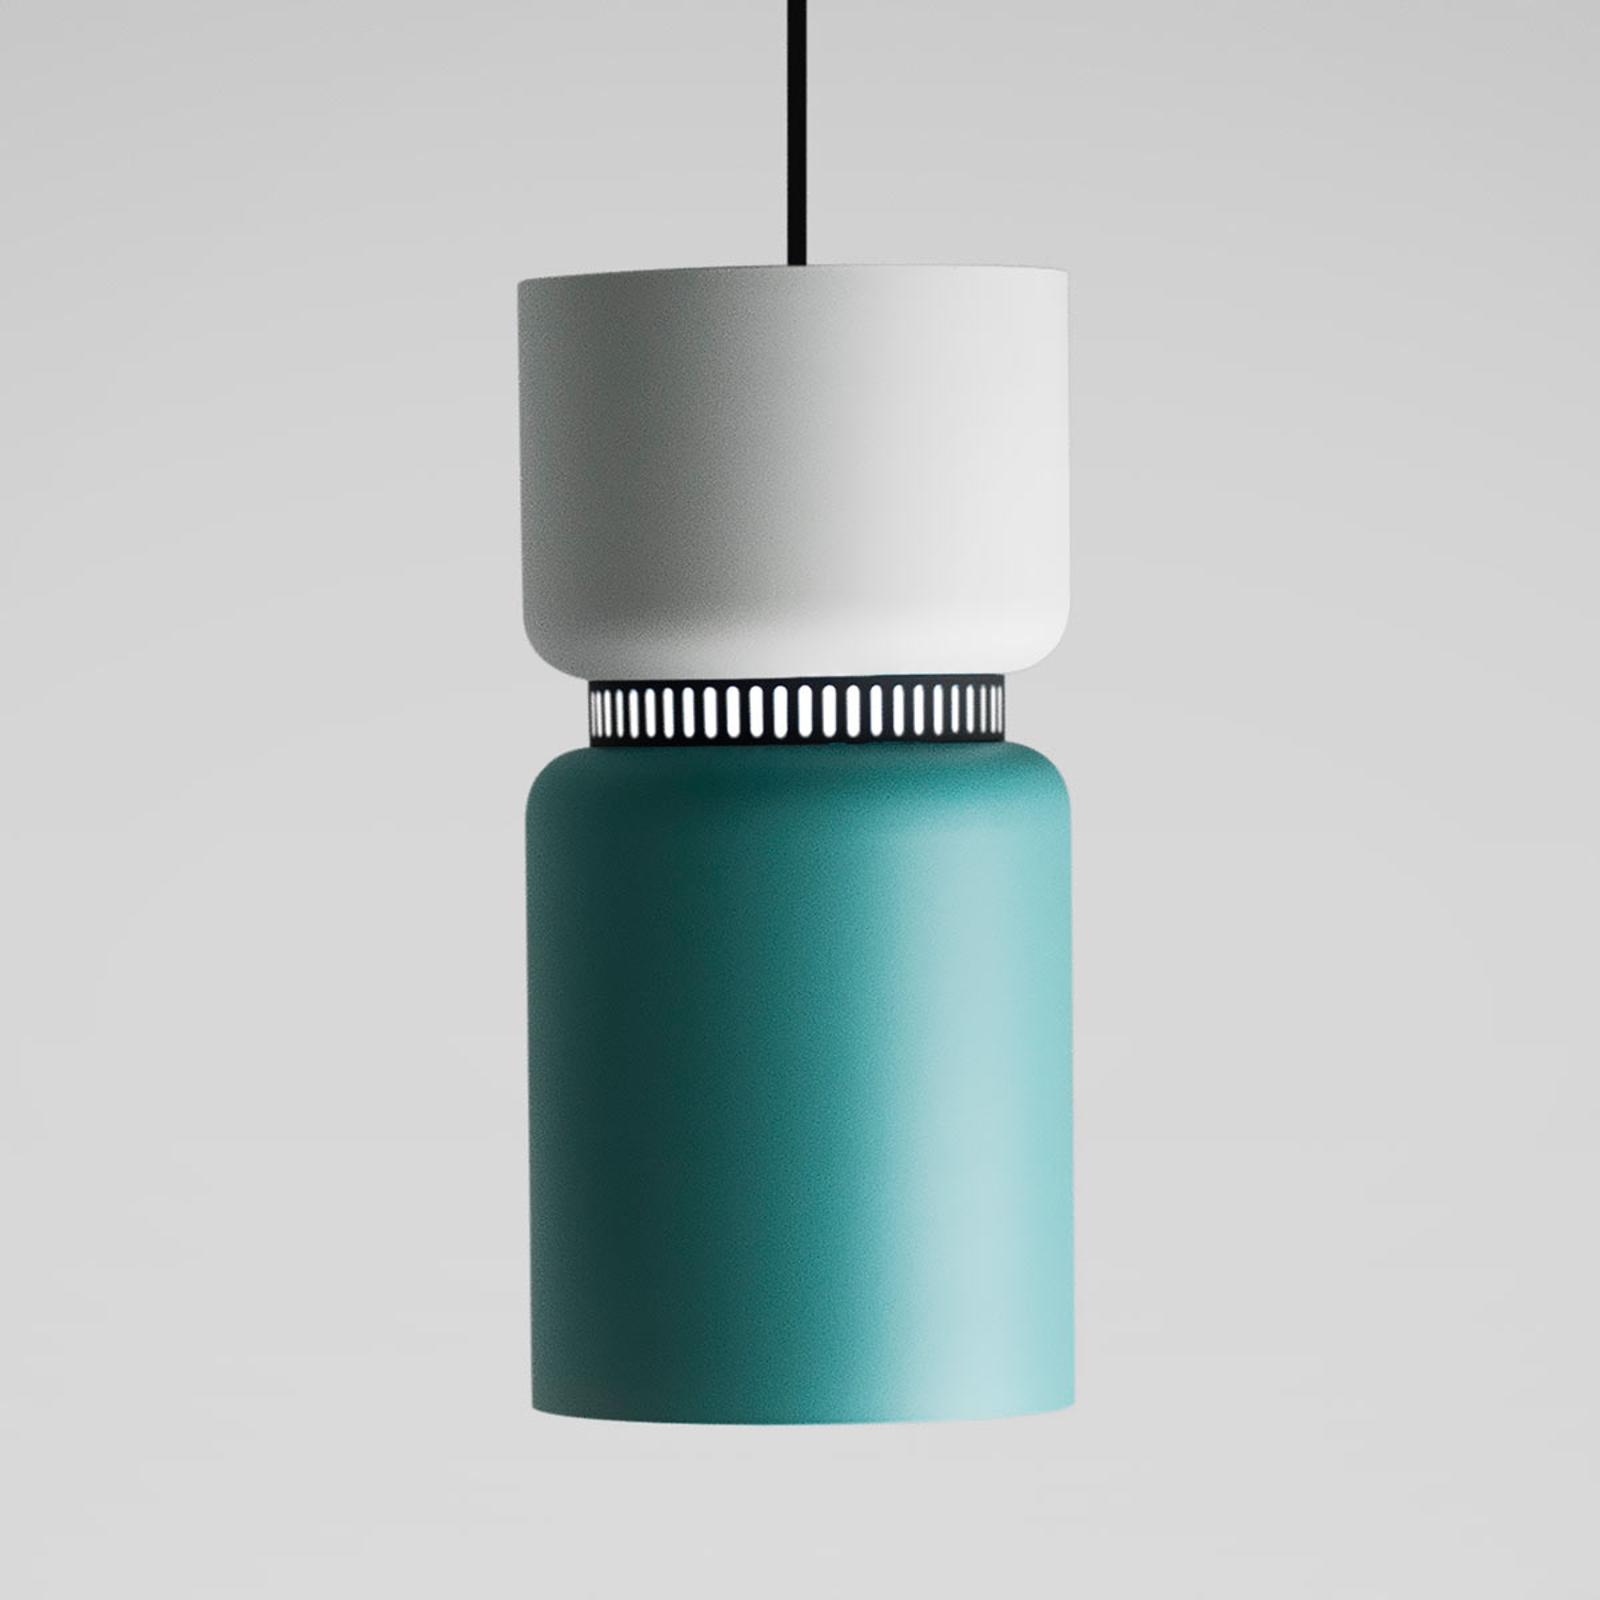 Suspension LED Aspen S blanc-turquoise 17 cm